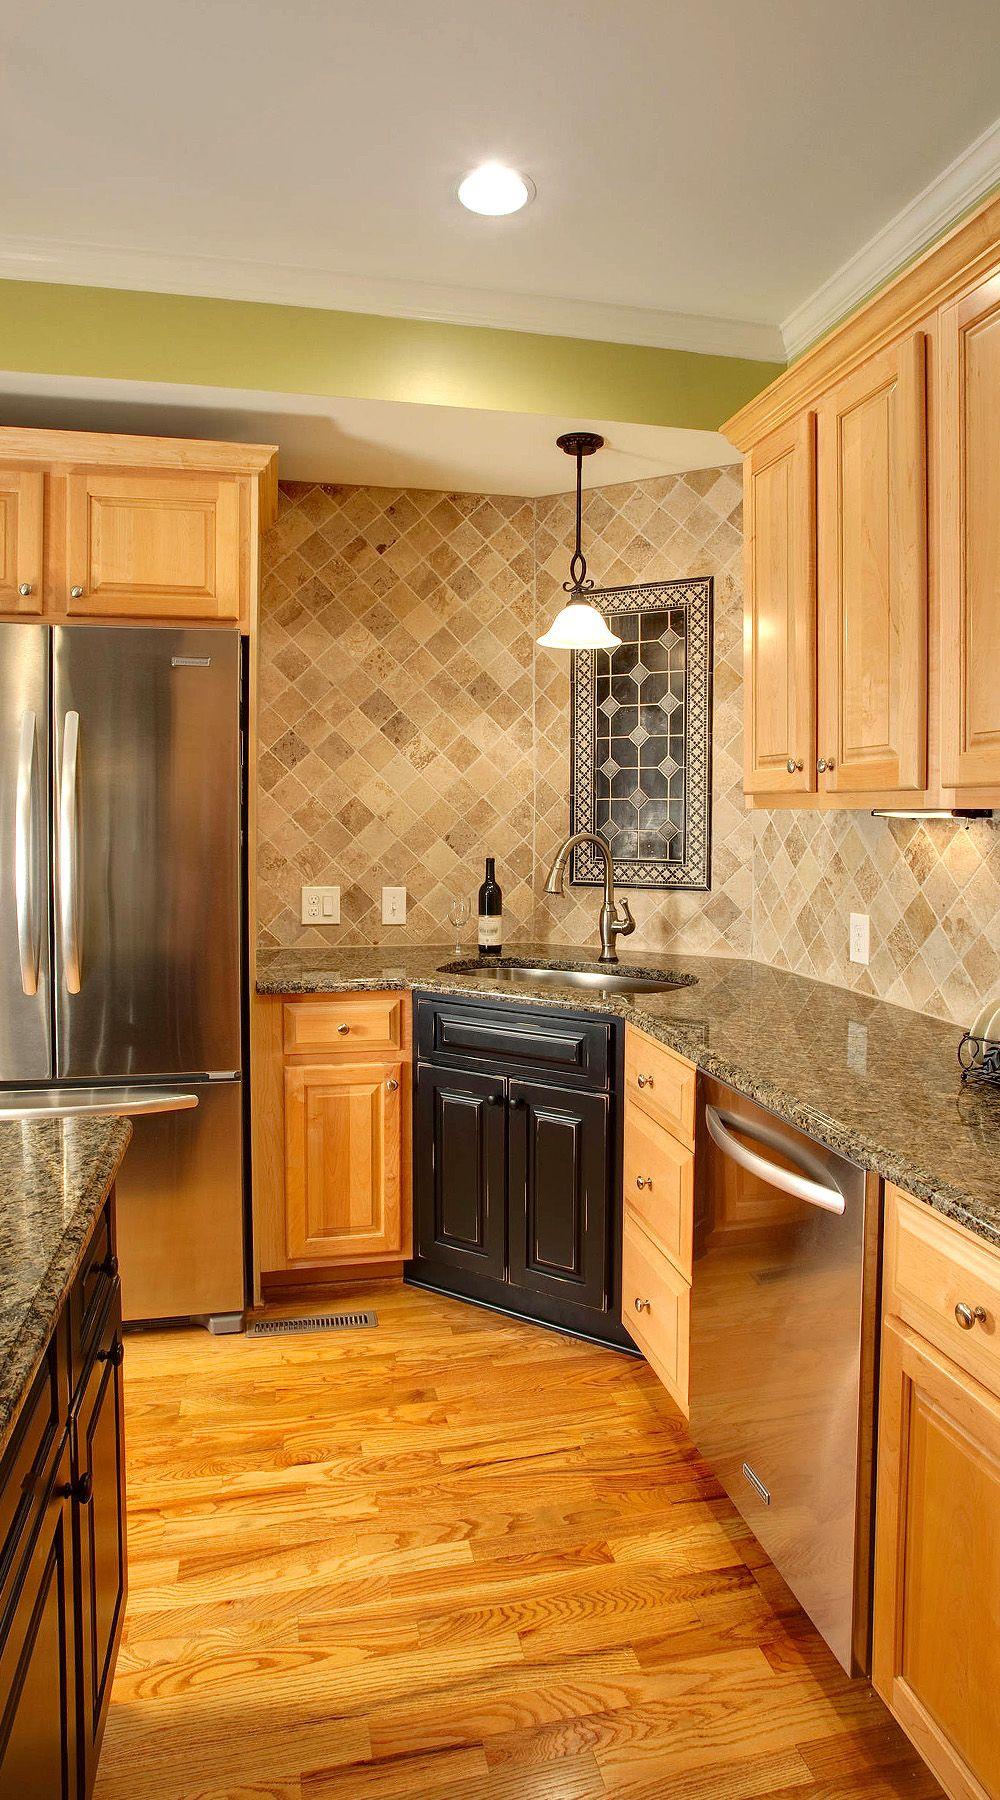 29 Ivory Travertine Backsplash Tile Ideas Natural Design Style In 2020 Honey Oak Cabinets Hardwood Floors In Kitchen Black Kitchen Countertops